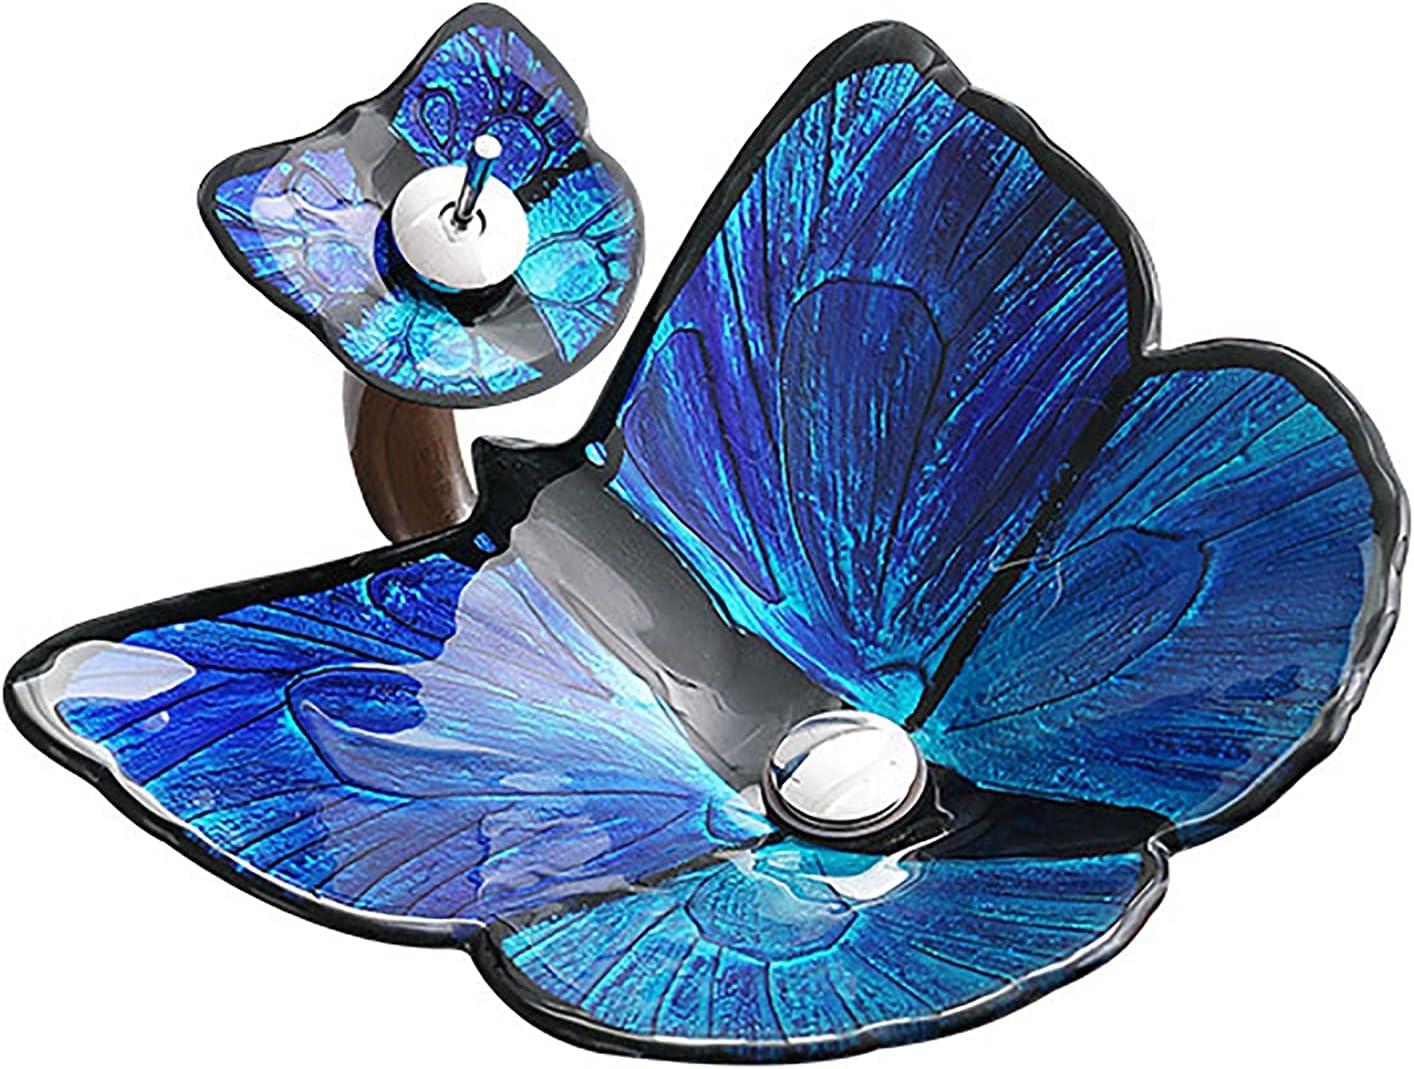 SHUGUANG Lavabo de Vidrio Templado, Lavabo Cristal Templado Forma de Mariposa Lavamanos Cristal Baño, Lavabo sobre Encimera para Baño con Grifo de Cascada, Drenaje de Agua, 620×450×155mm,Azul